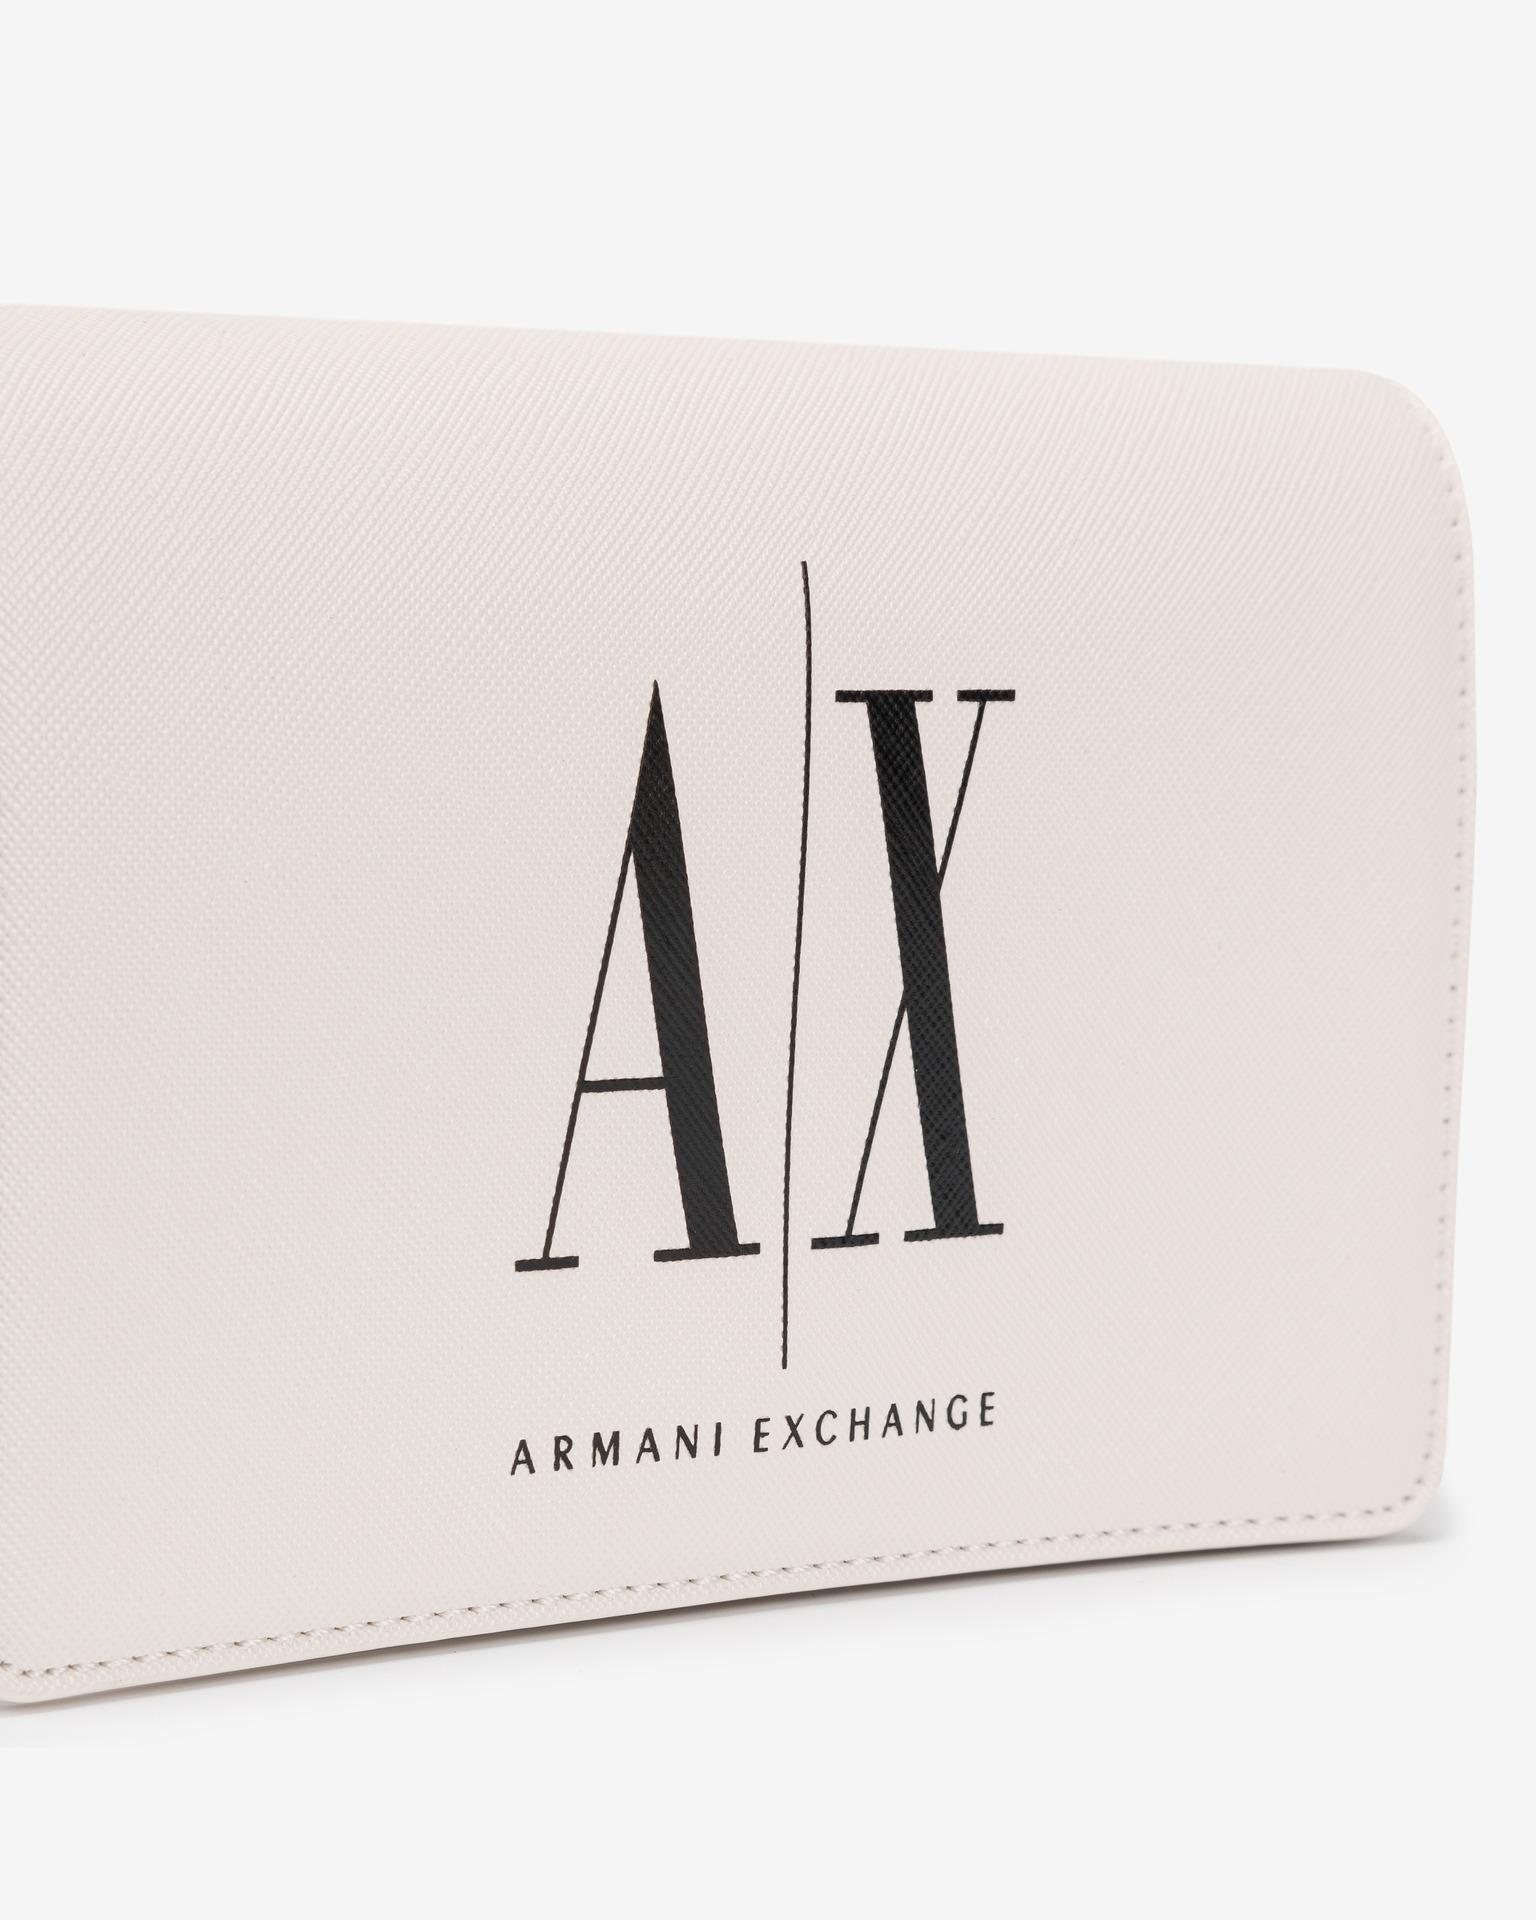 Armani Exchange white handbag